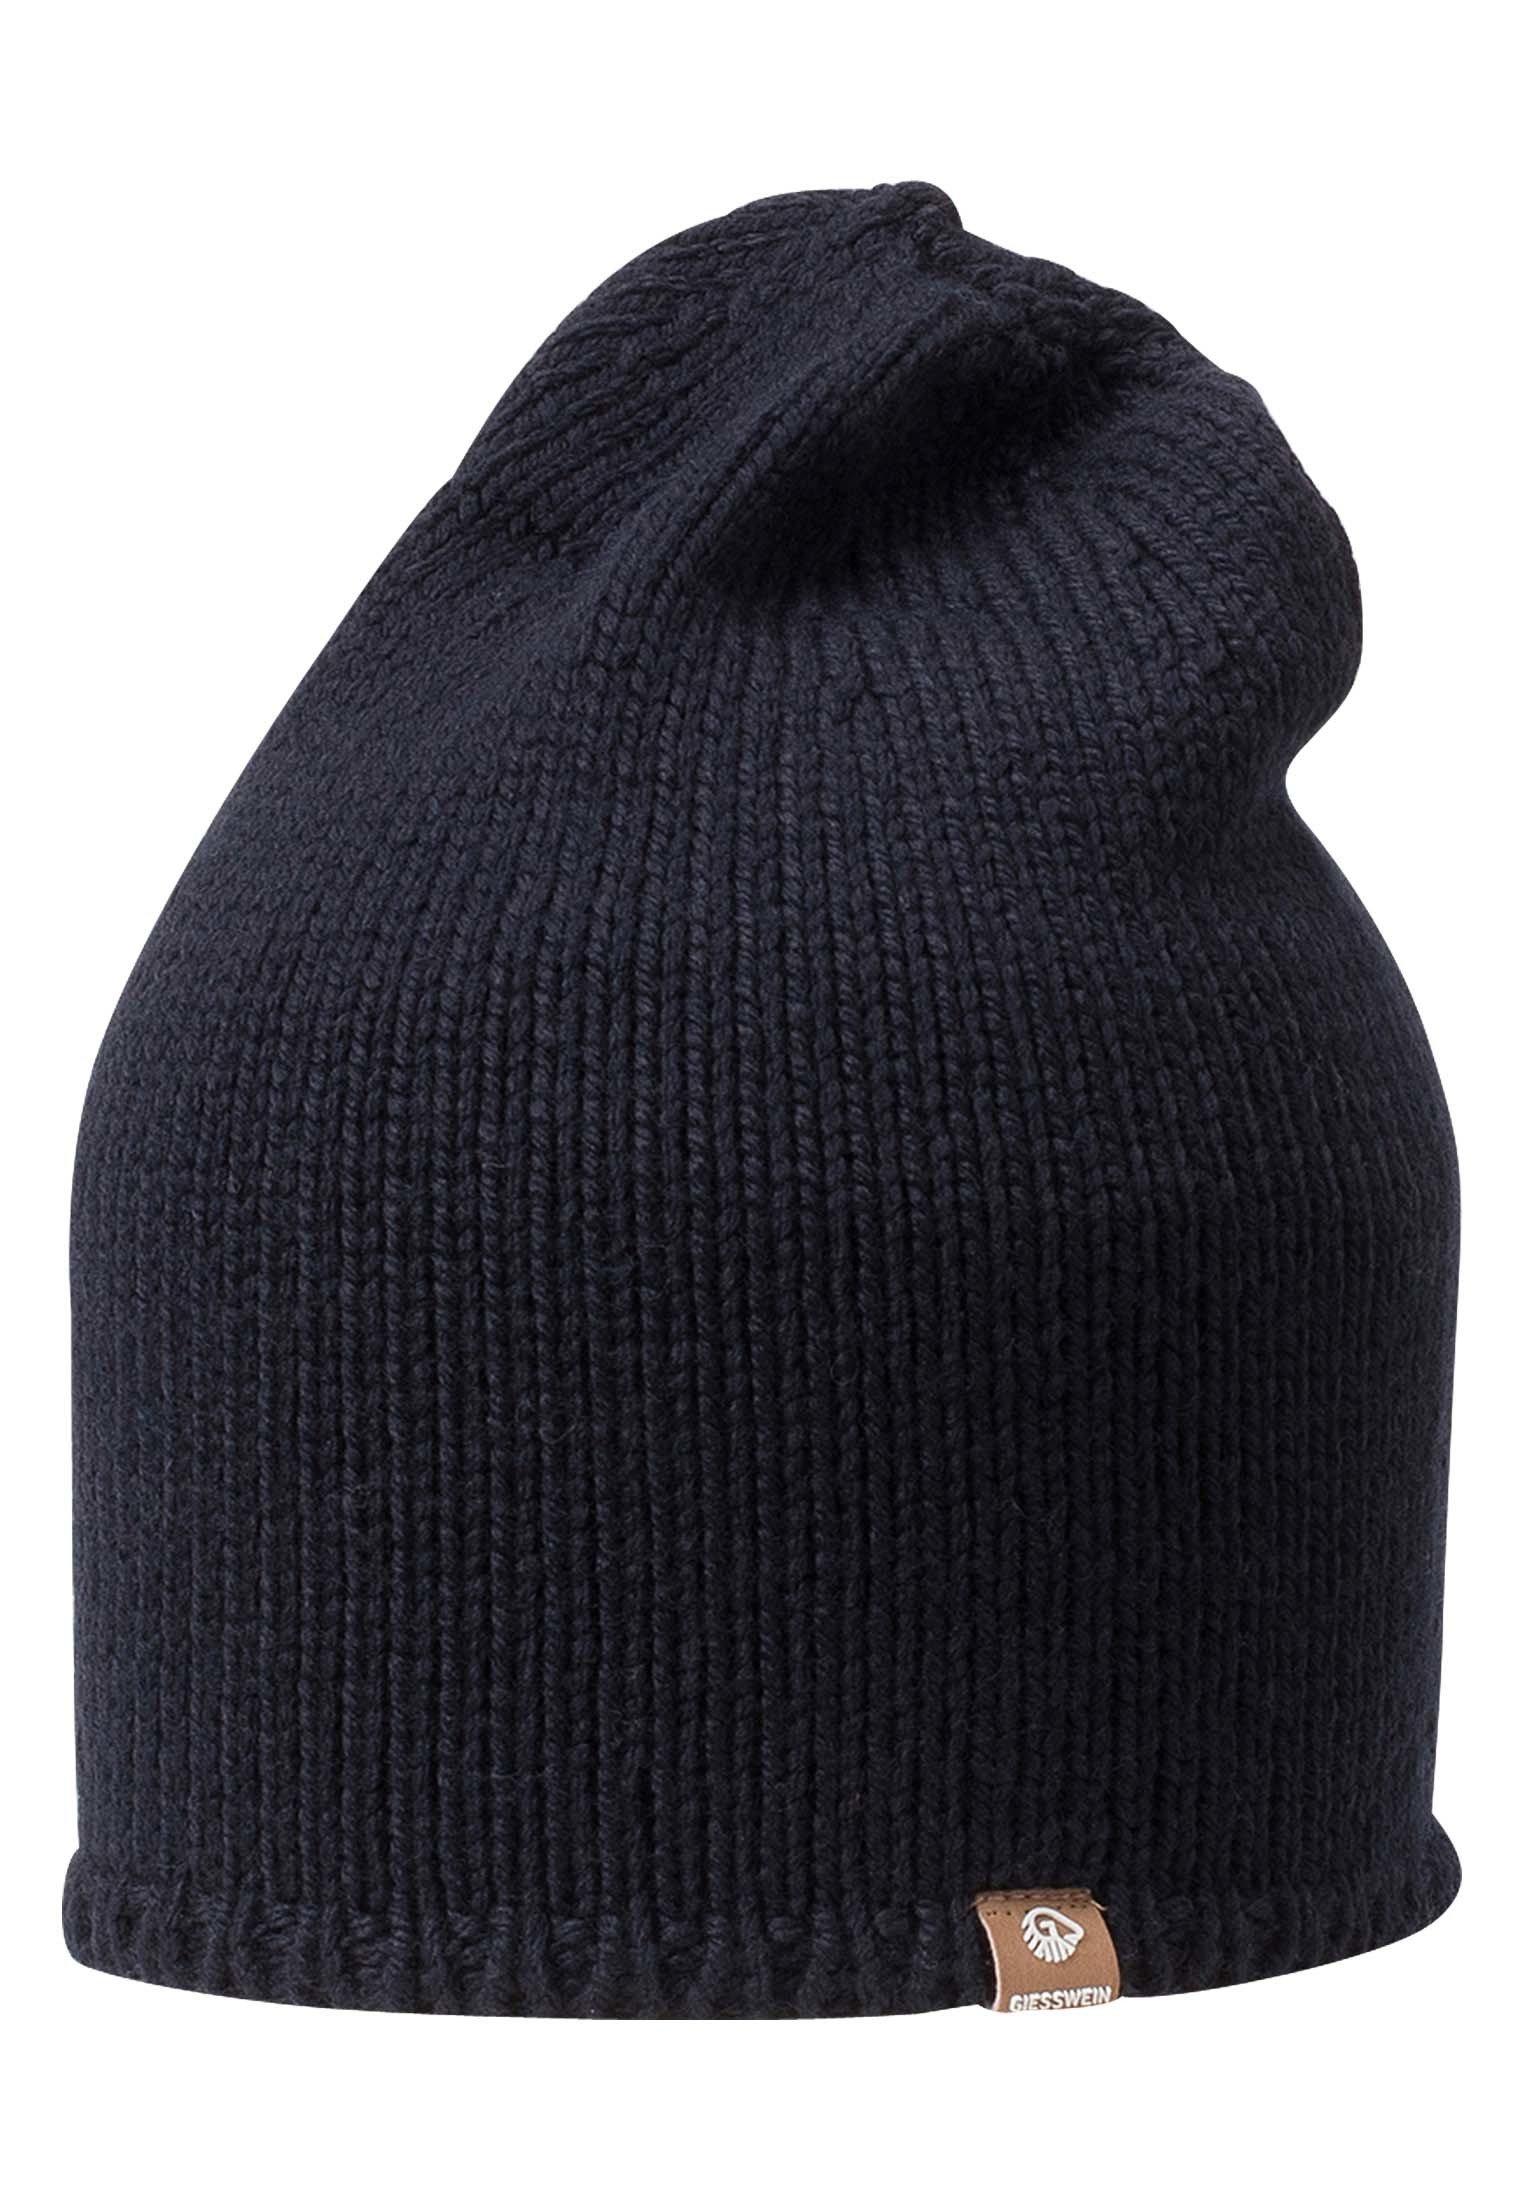 Giesswein Hohloh - Mütze Dark Blue/dunkelblau